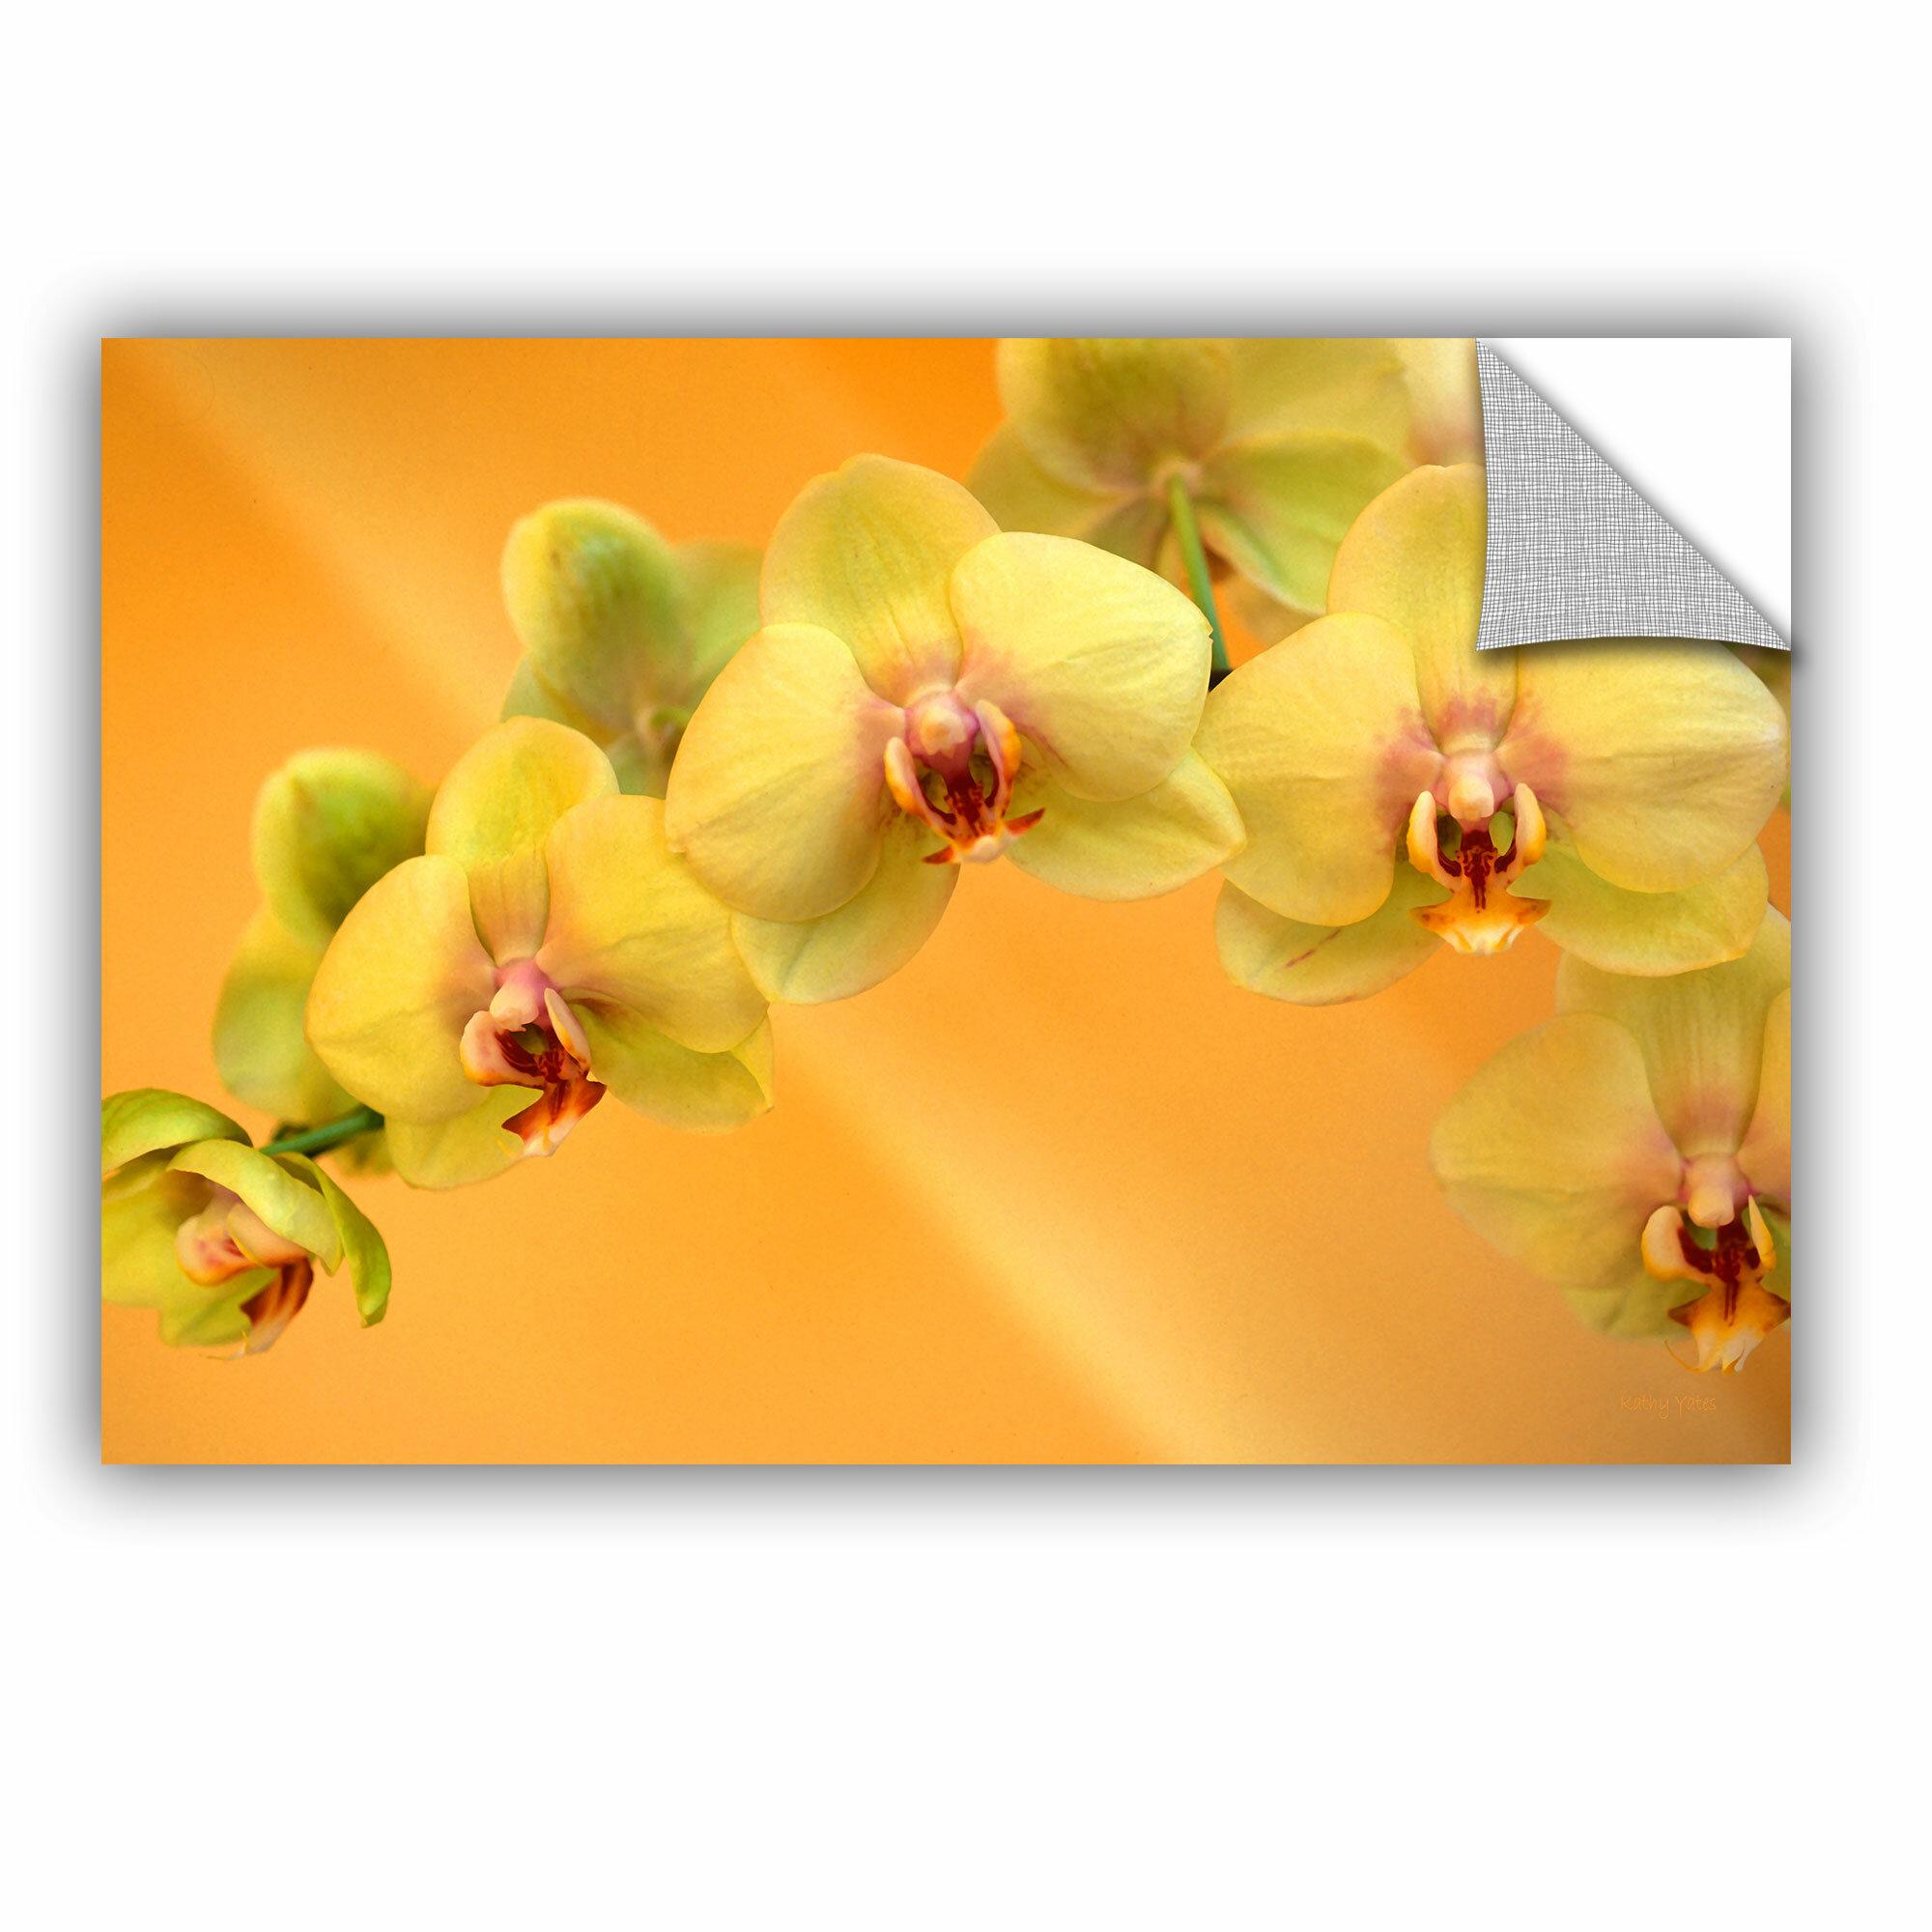 Artwall Yellow Phalaenopsis By Kathy Yates Photographic Print Removable Wall Decal Wayfair